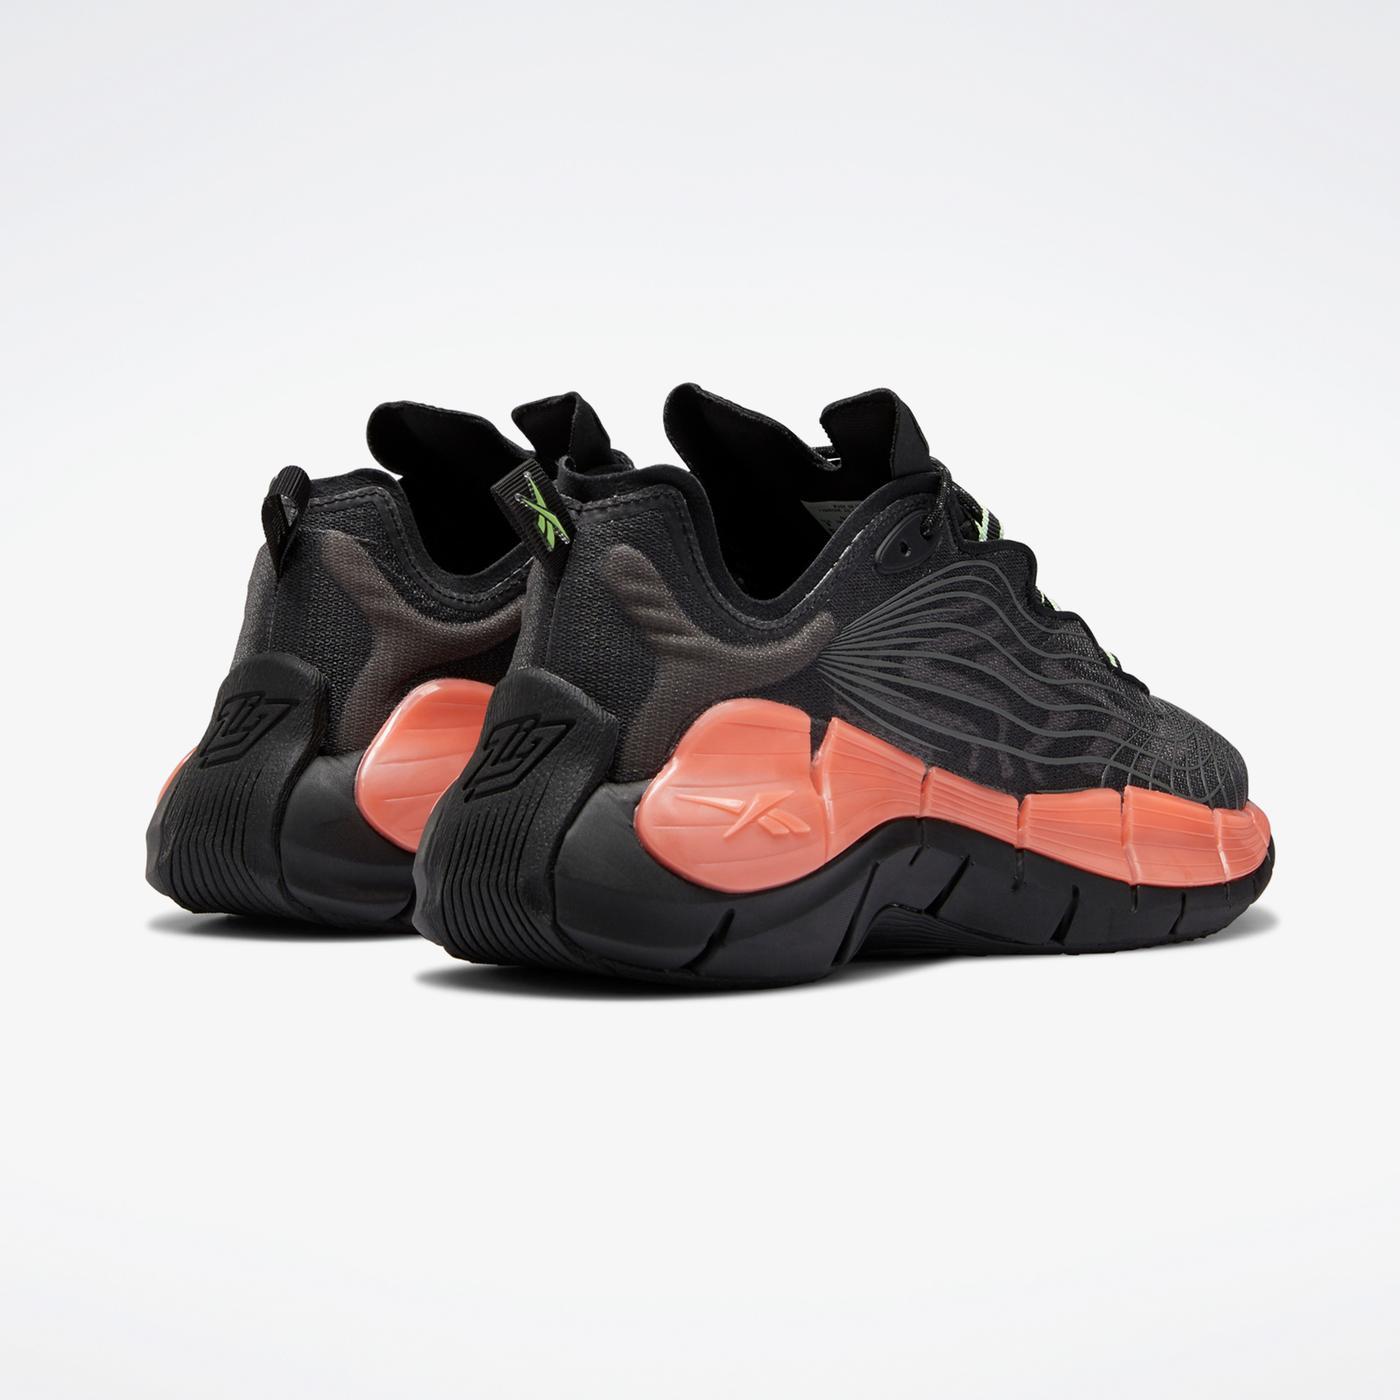 Reebok Zig Kinetica II Unisex Siyah Spor Ayakkabı